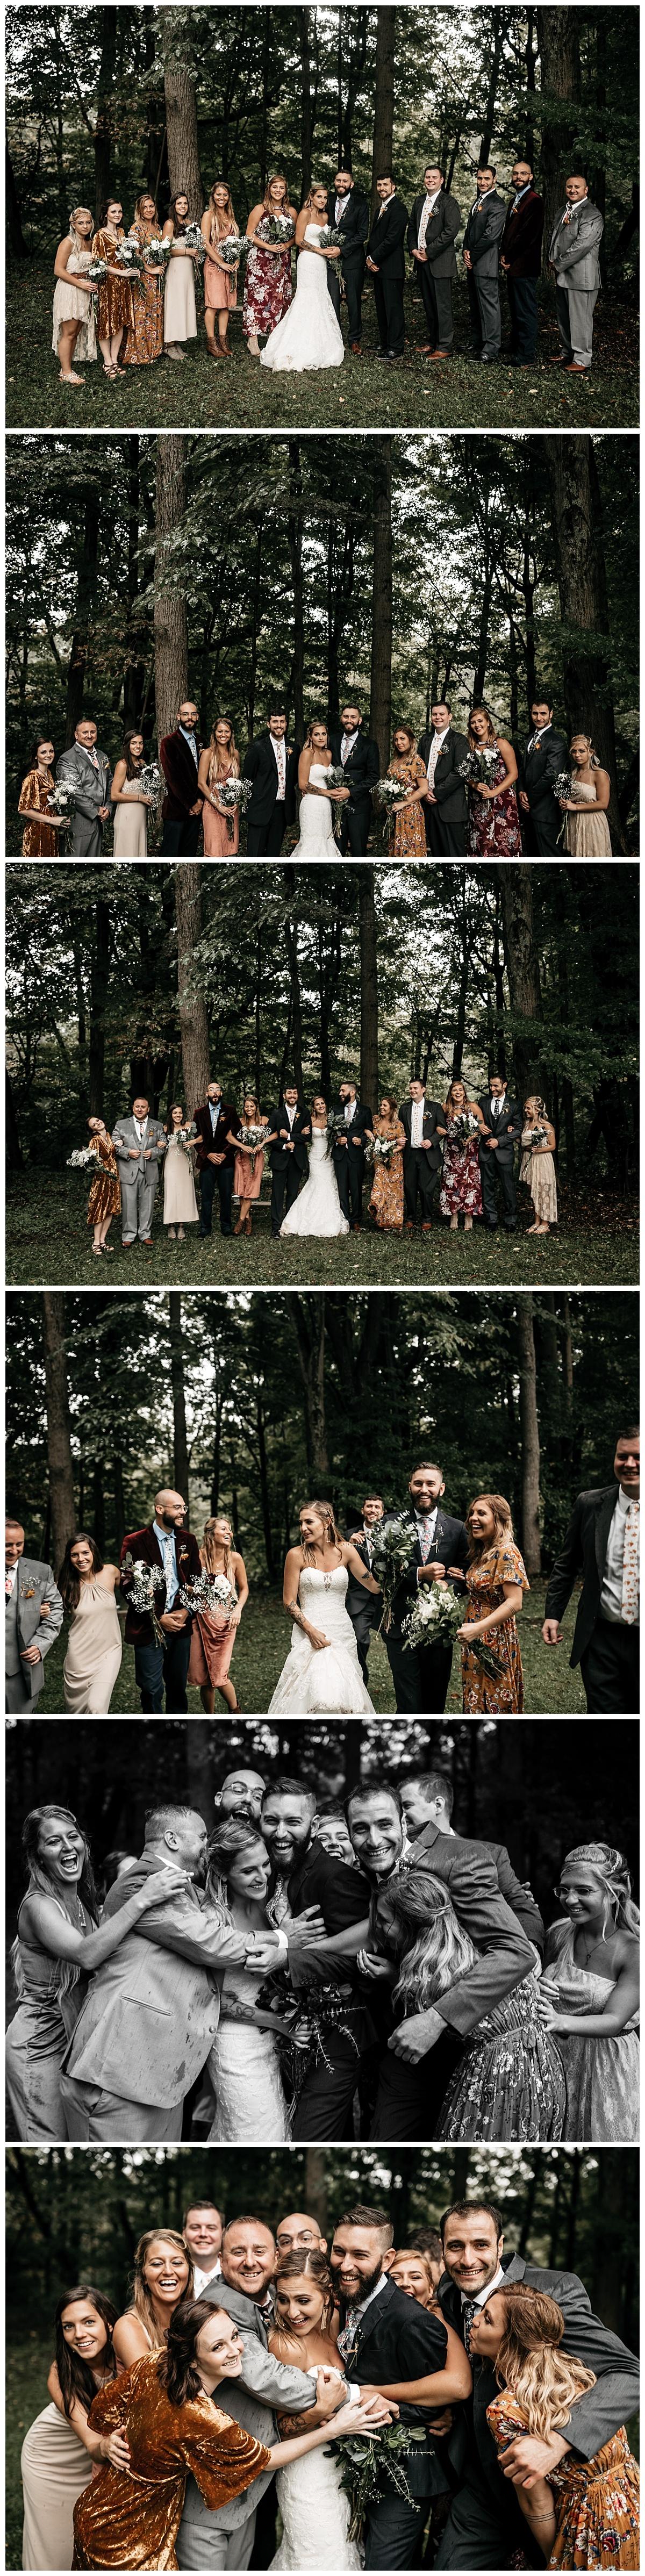 grovecitypabackyardweddingweddingphotographer_0028.jpg